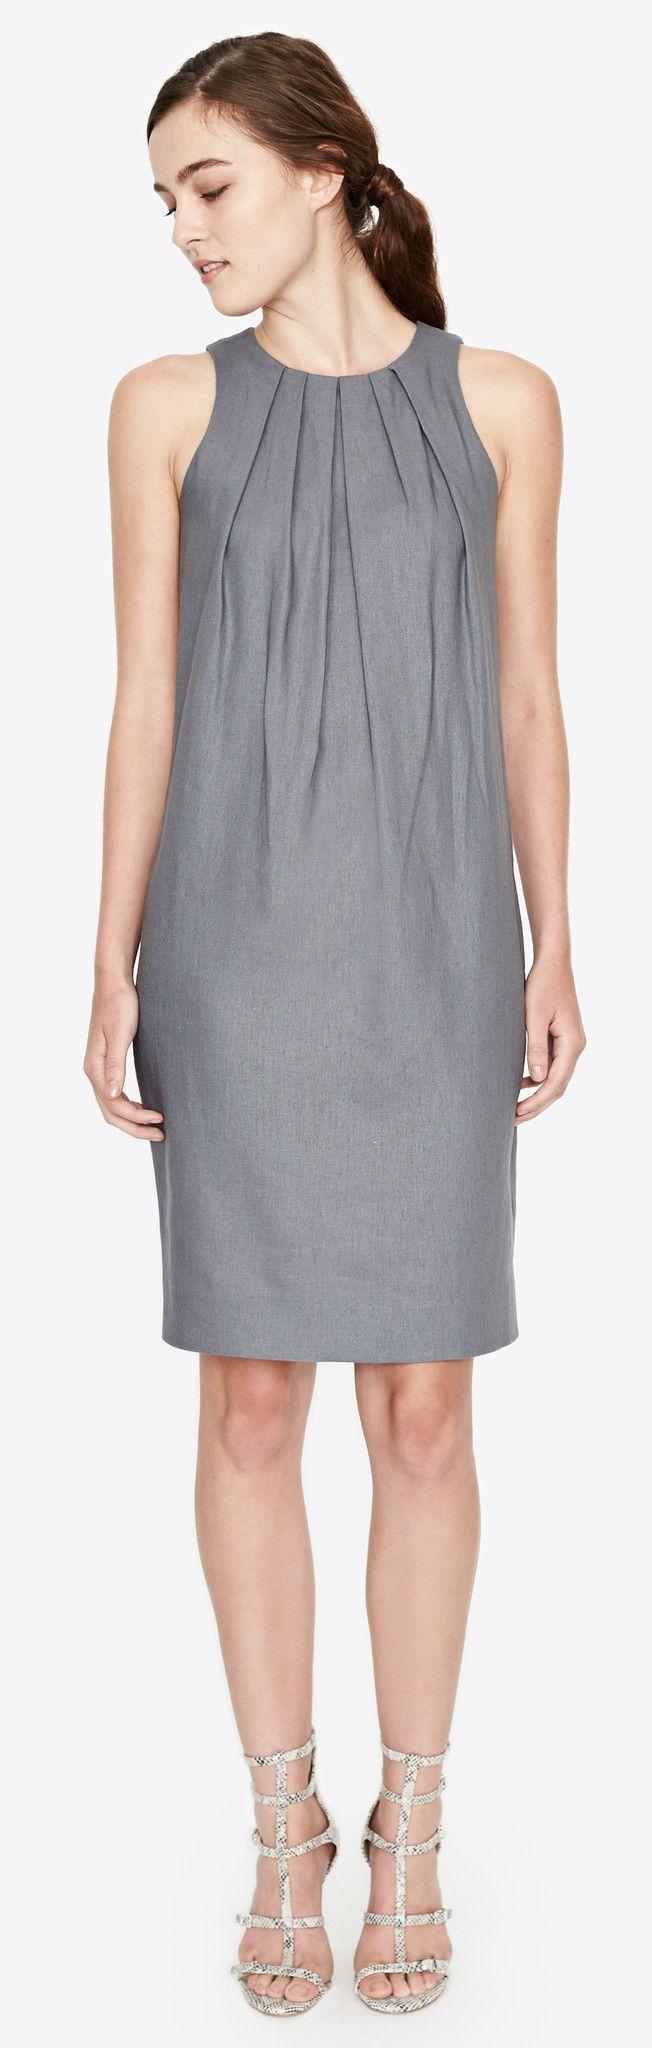 Bankes  Dress / Kim and Proper